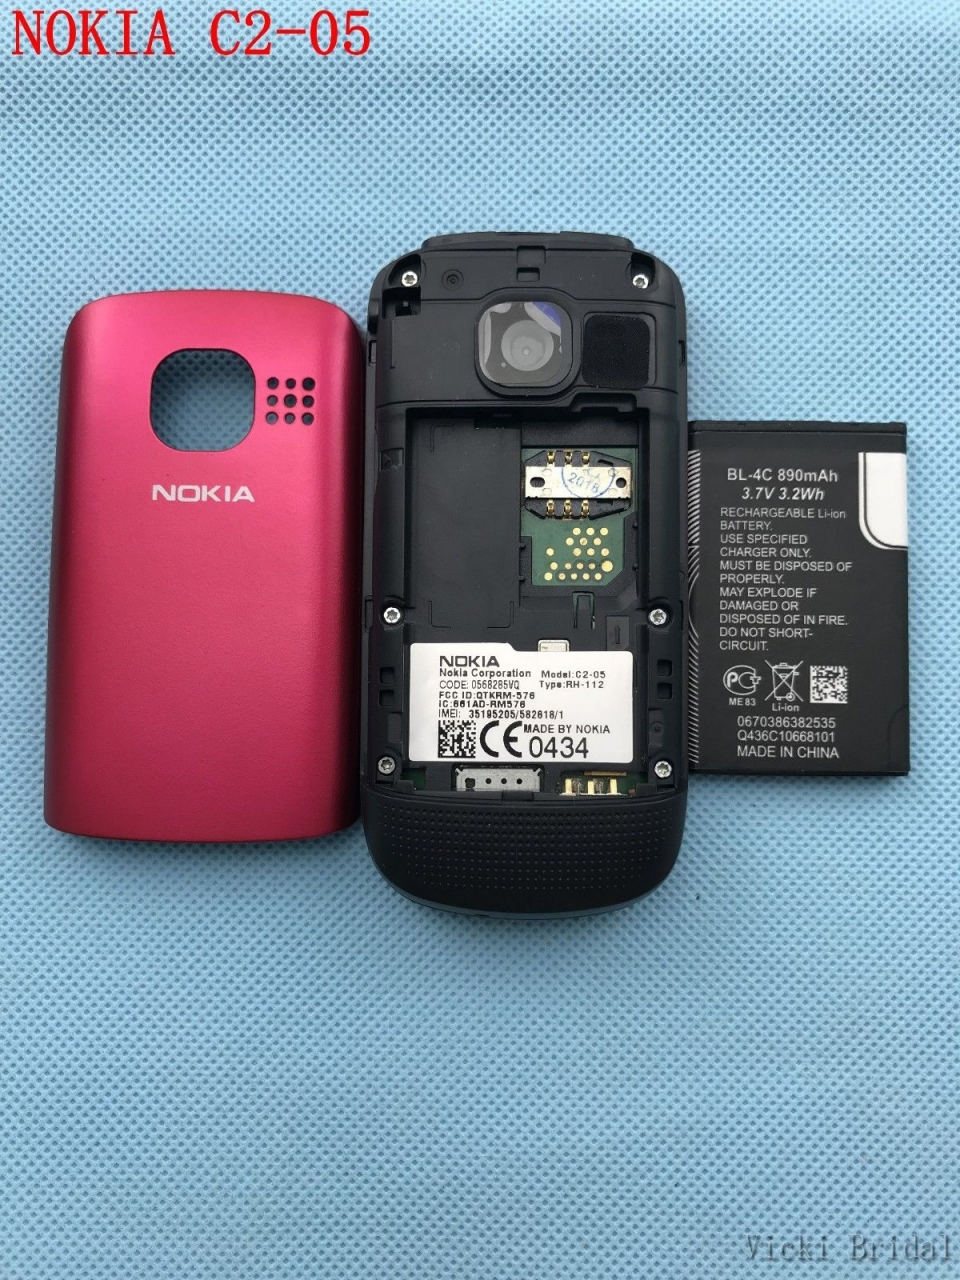 Refurbished phone Original Unlocked Nokia C2-05 slide cell phone Bluetooth phone black 5